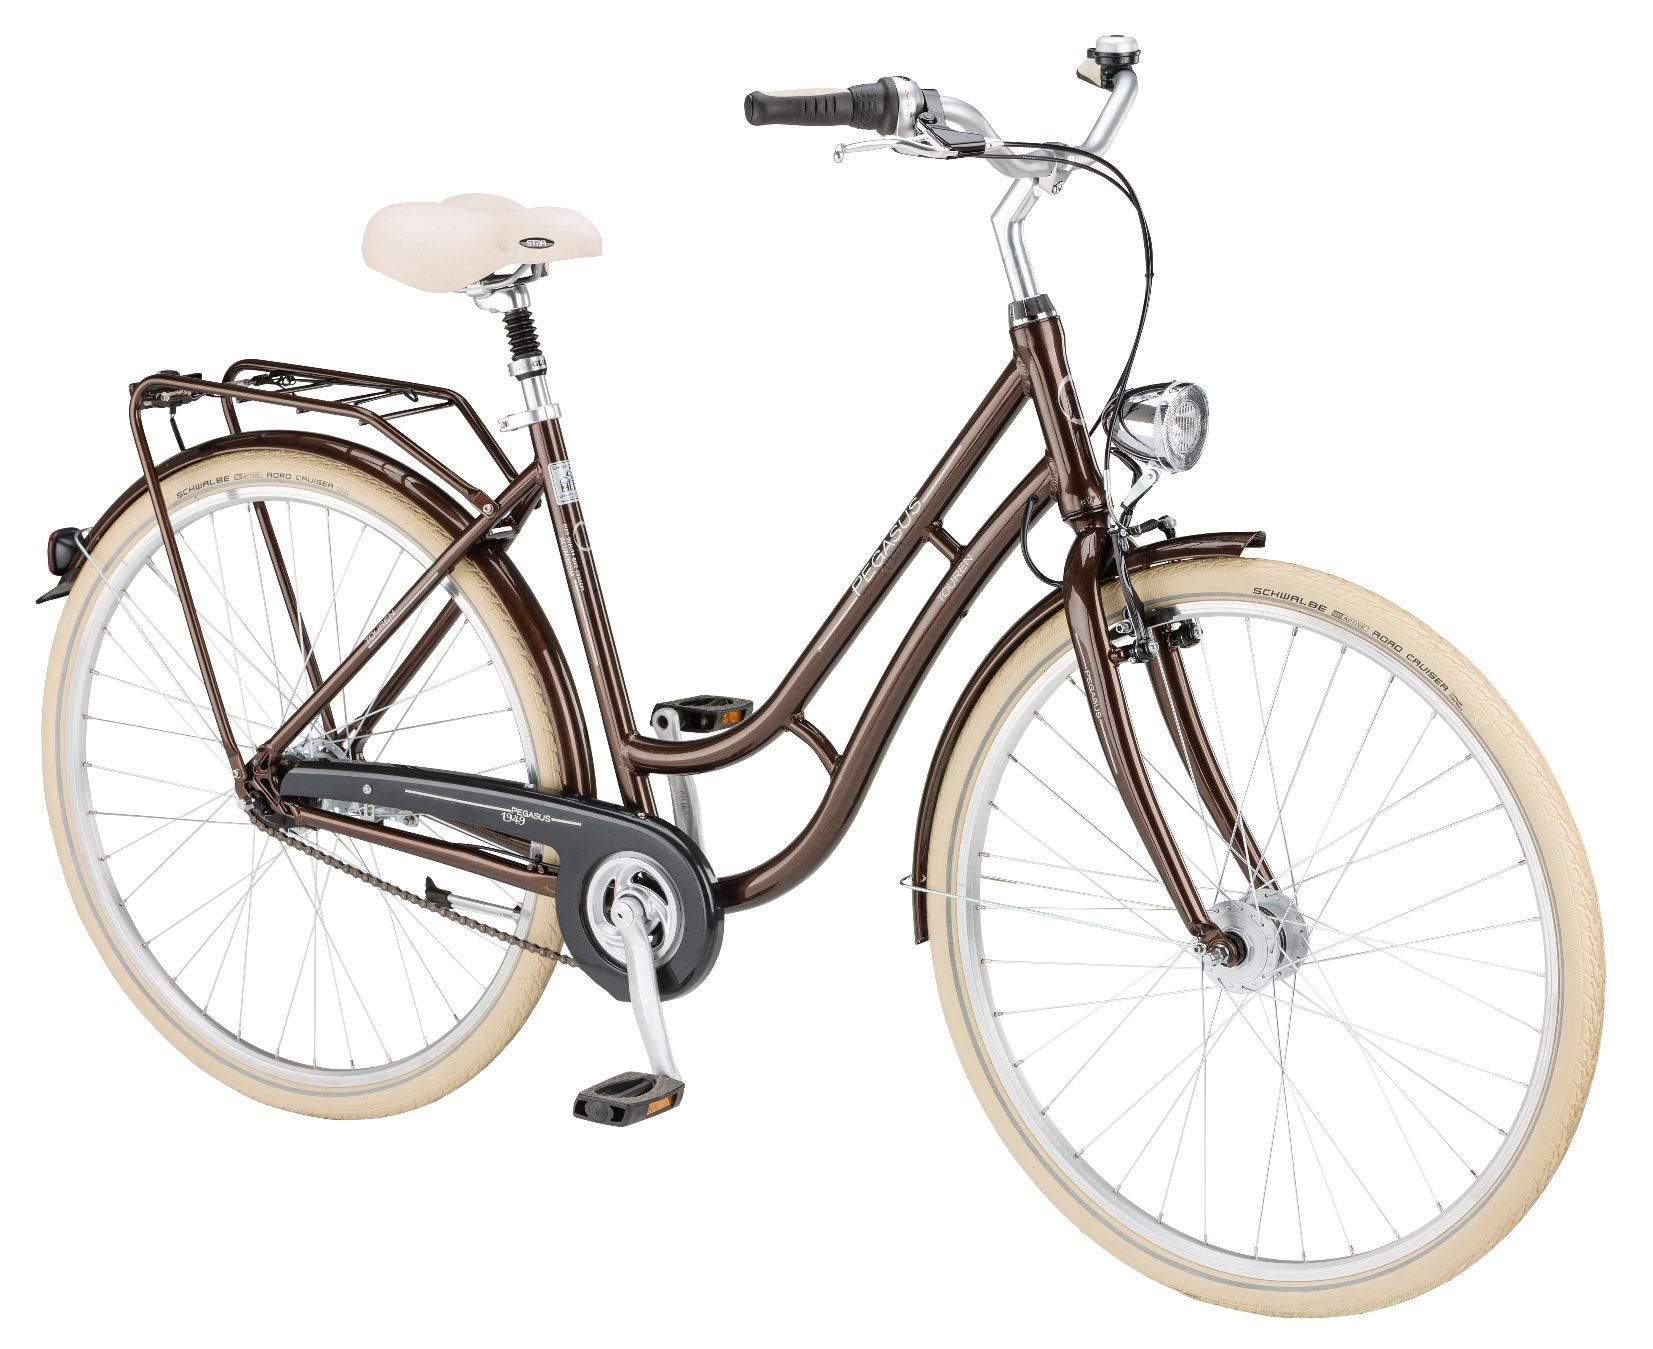 damen pegasus 1949 28 zoll fahrrad shimano 3 gang braun 45. Black Bedroom Furniture Sets. Home Design Ideas